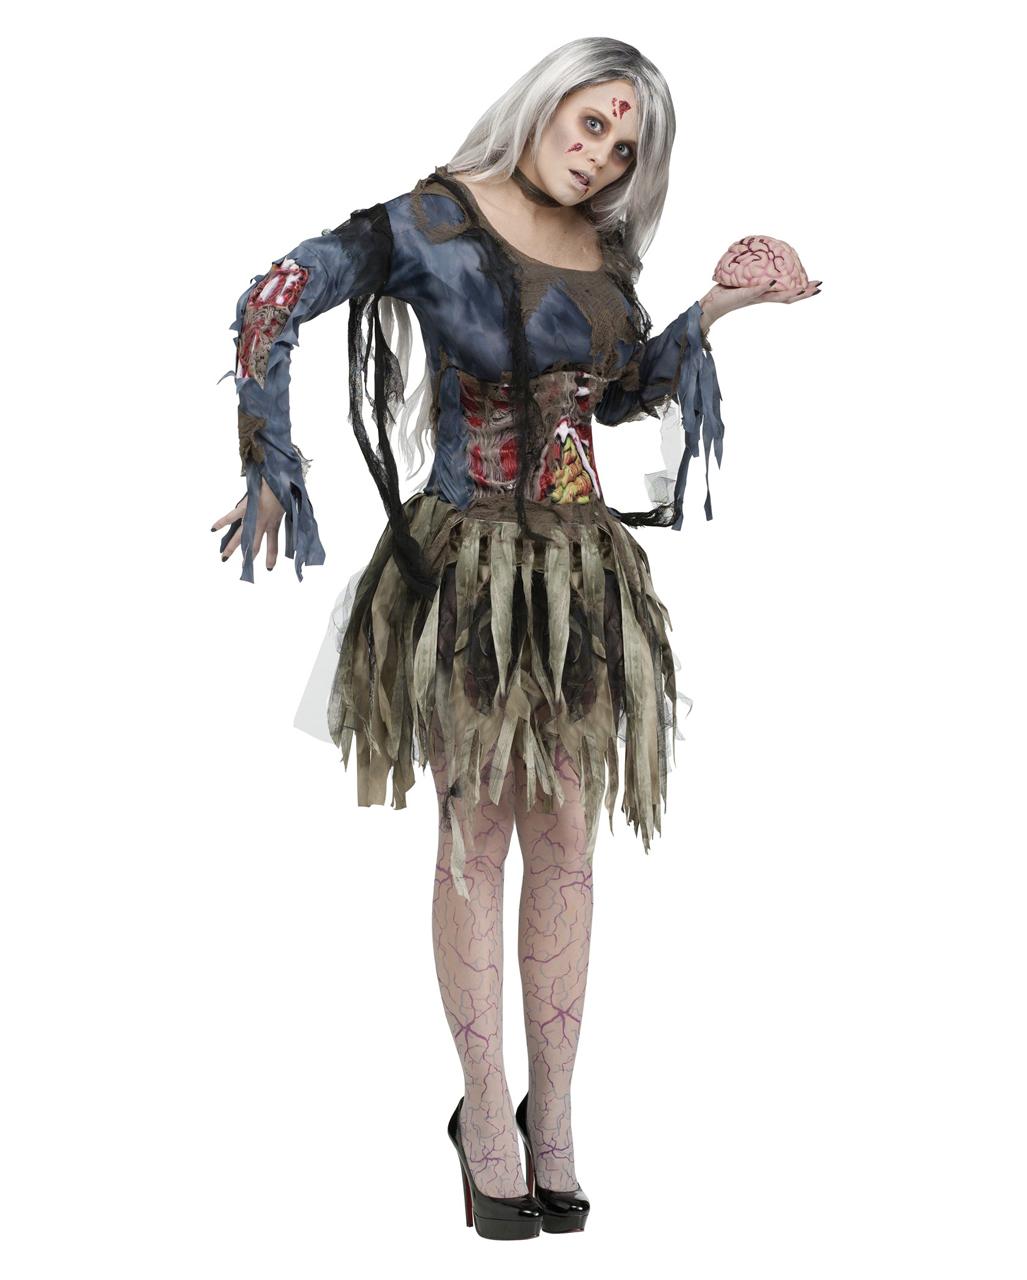 Sexy 3d Zombiekostüm Für Frauen Zombie Kostüm Mit 3d Look Horror